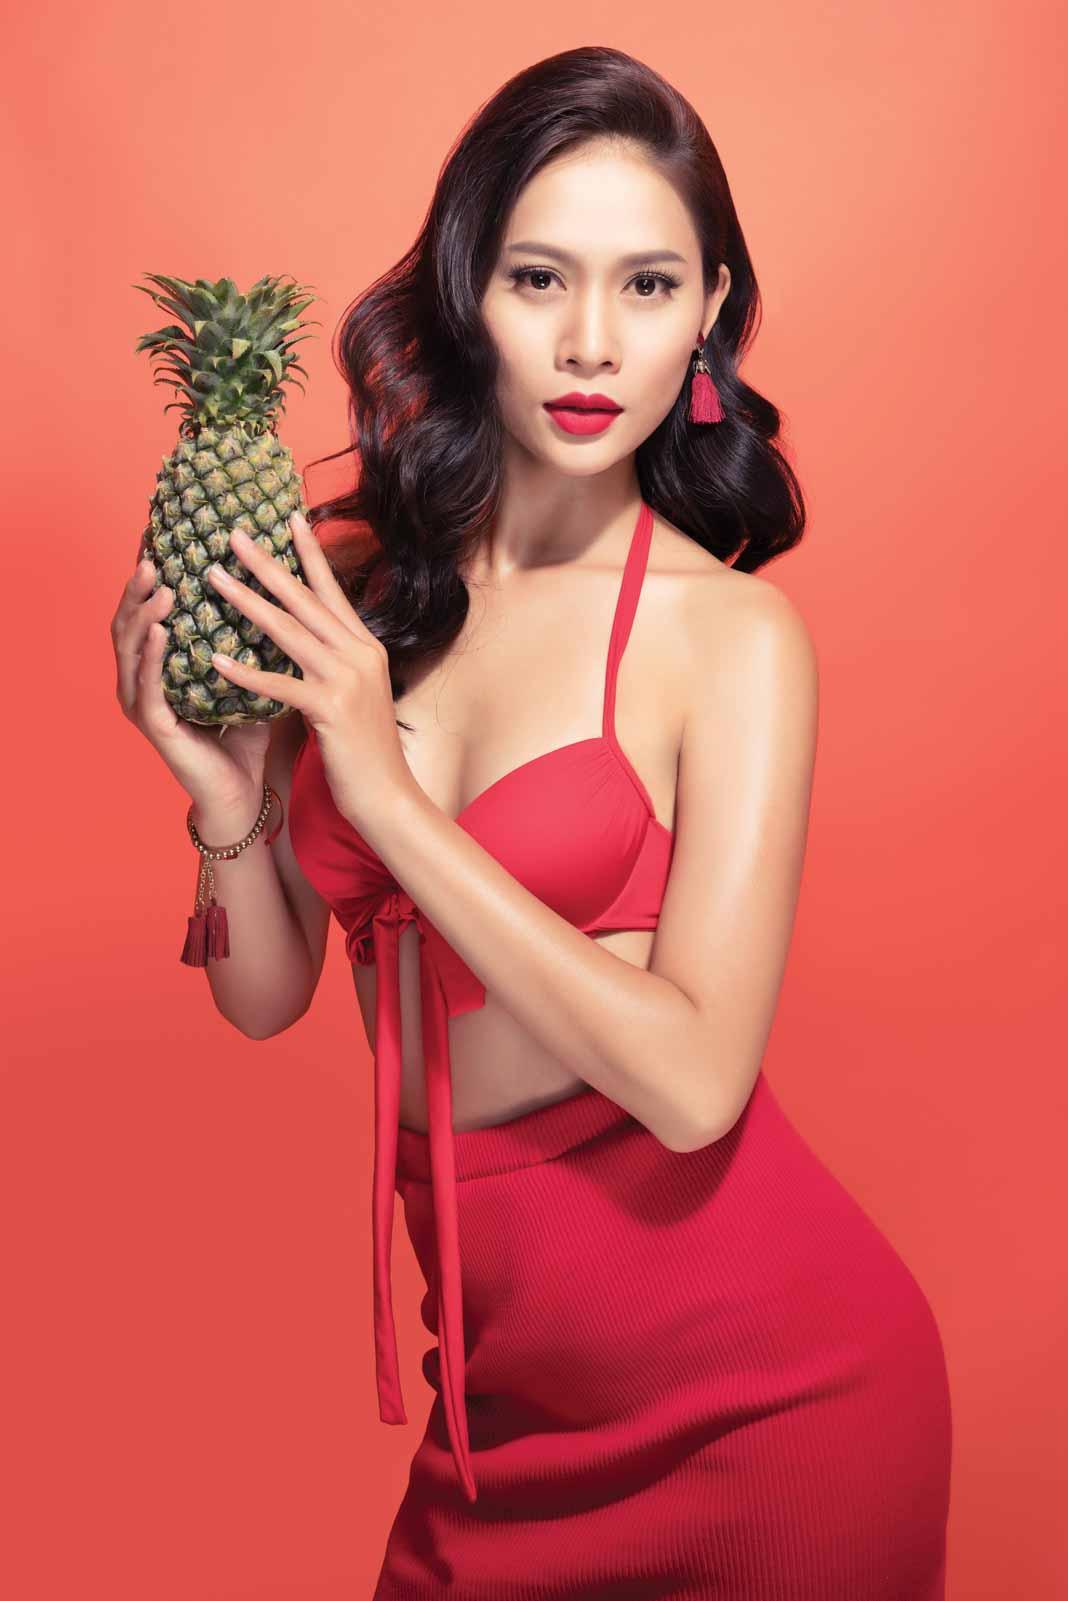 Bikini-cho-quy-co-ca-tinh-TT-657-2016-2